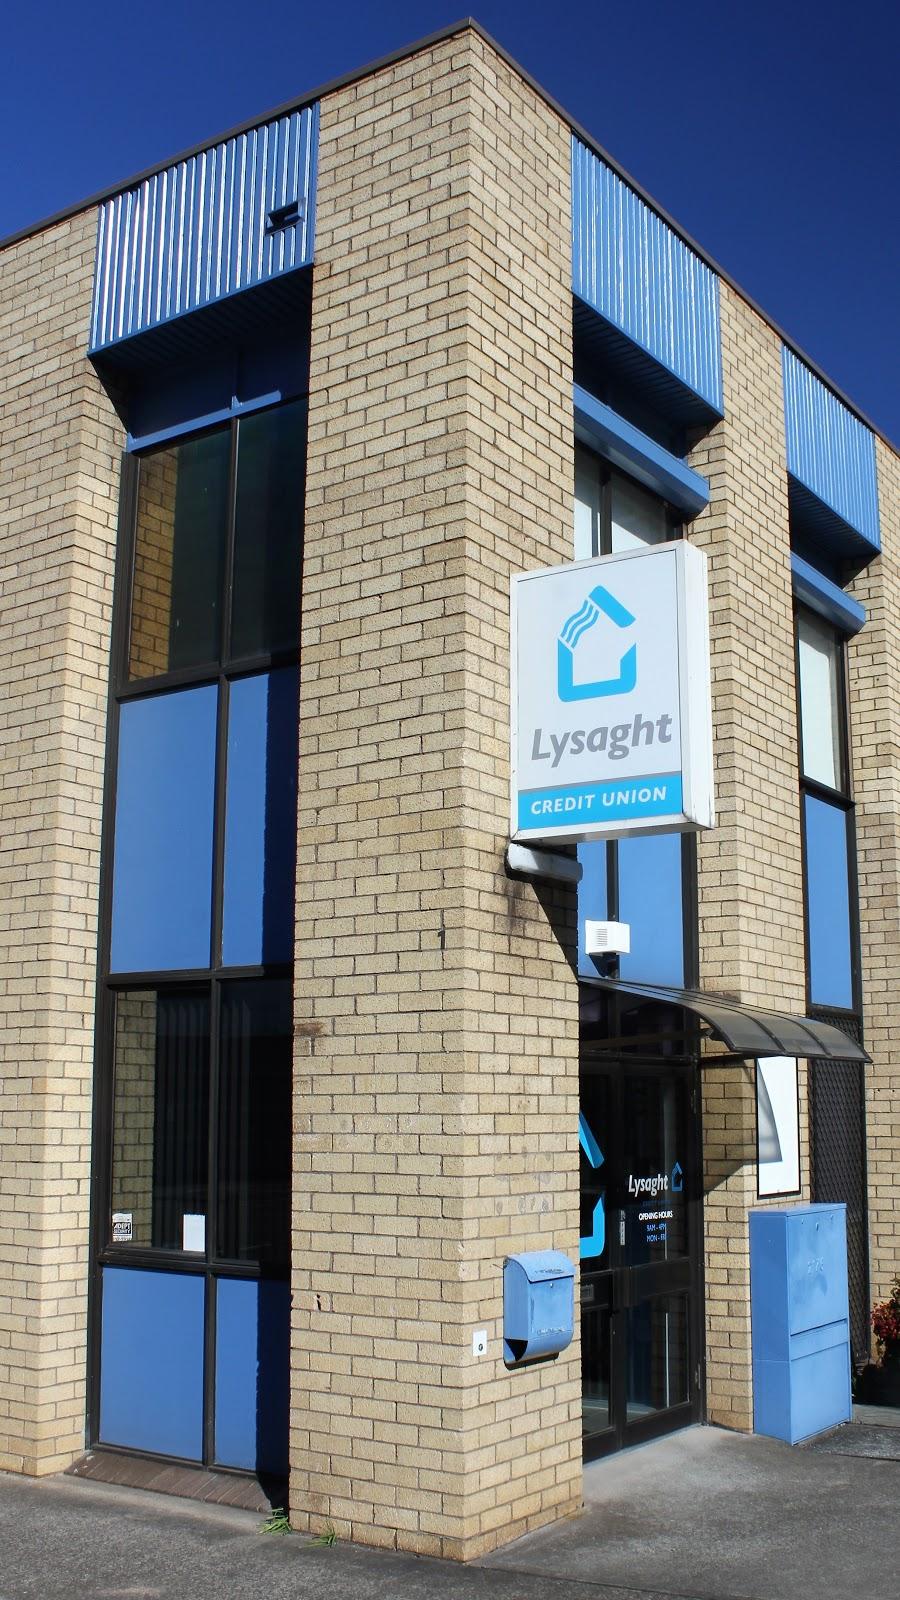 Lysaght Credit Union | atm | 13 Auburn St, Wollongong NSW 2500, Australia | 0242265900 OR +61 2 4226 5900